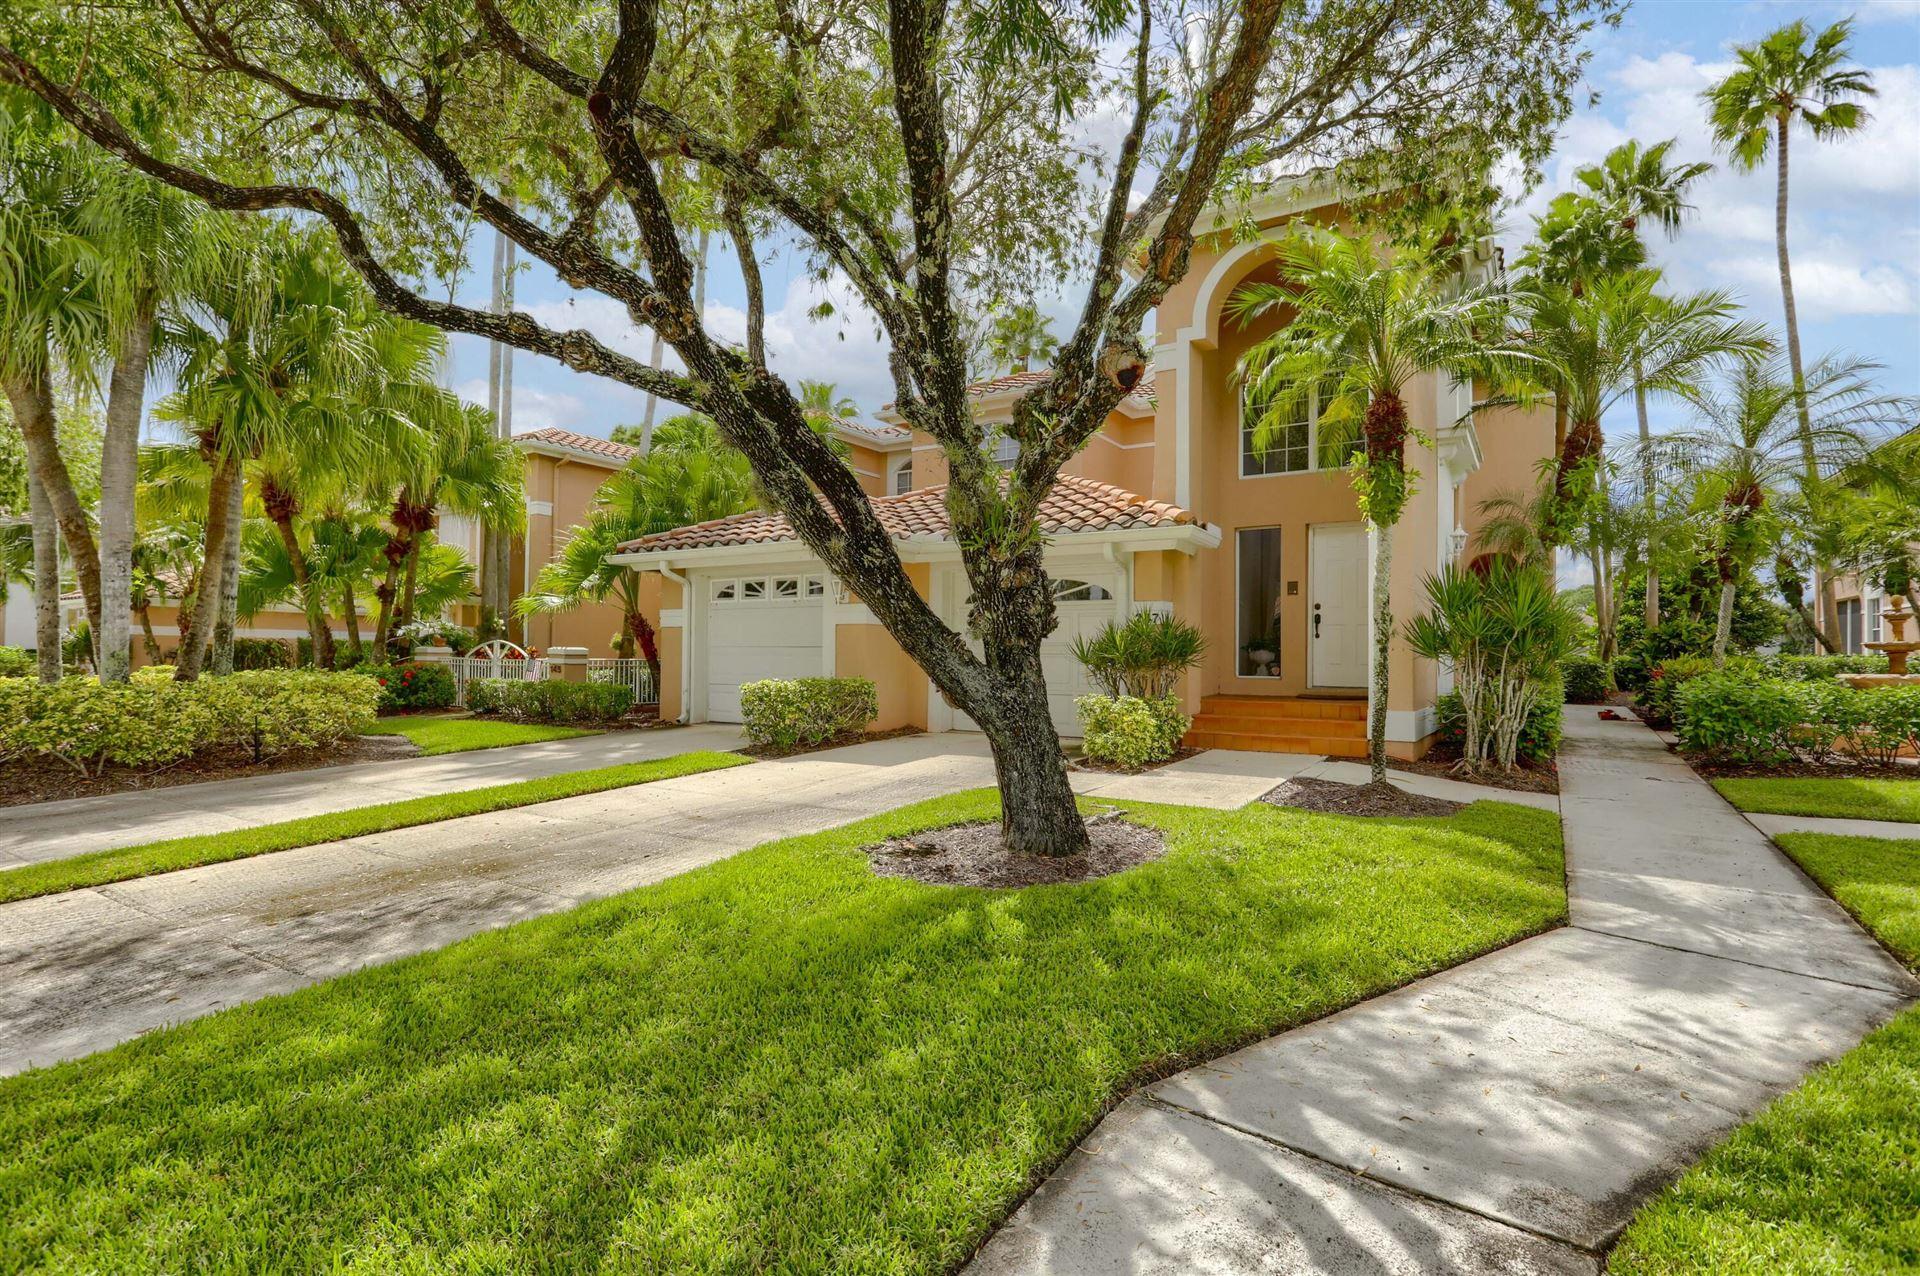 Photo of 247 Legendary Circle, Palm Beach Gardens, FL 33418 (MLS # RX-10747849)